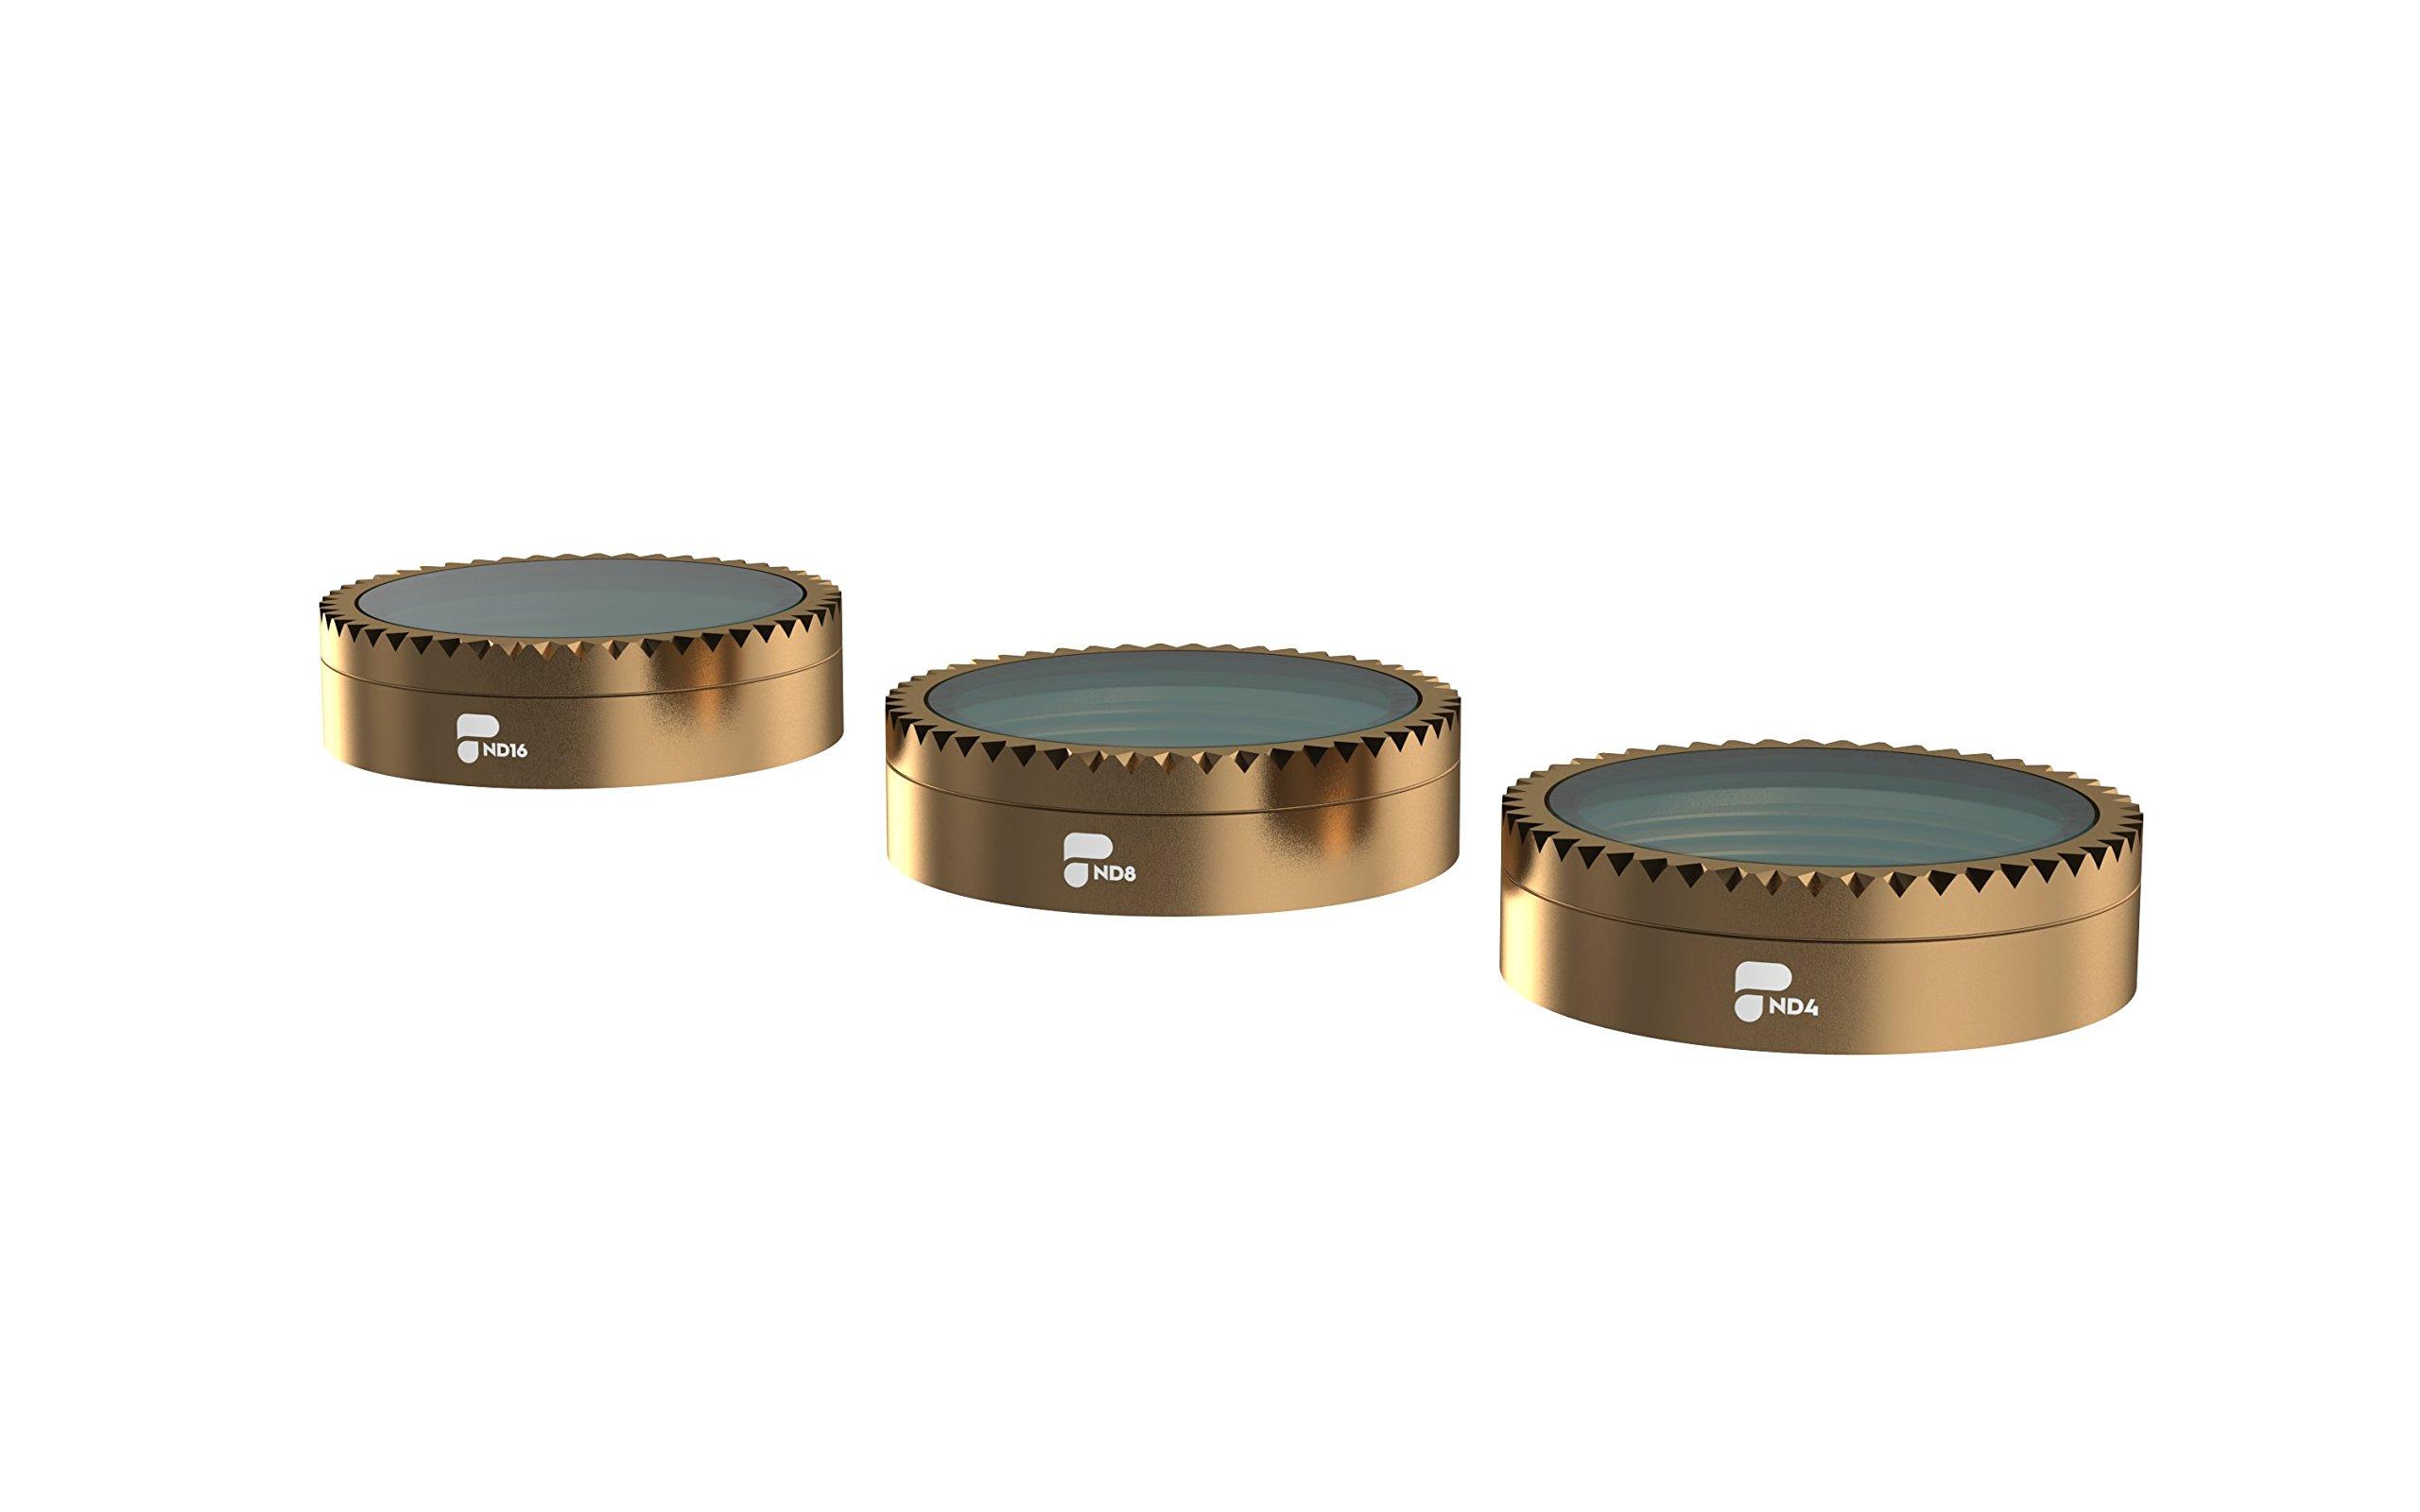 PolarPro Shutter Collection Filter 3-Pack (ND4, ND8, ND16) Cinema Series for DJI Mavic Air